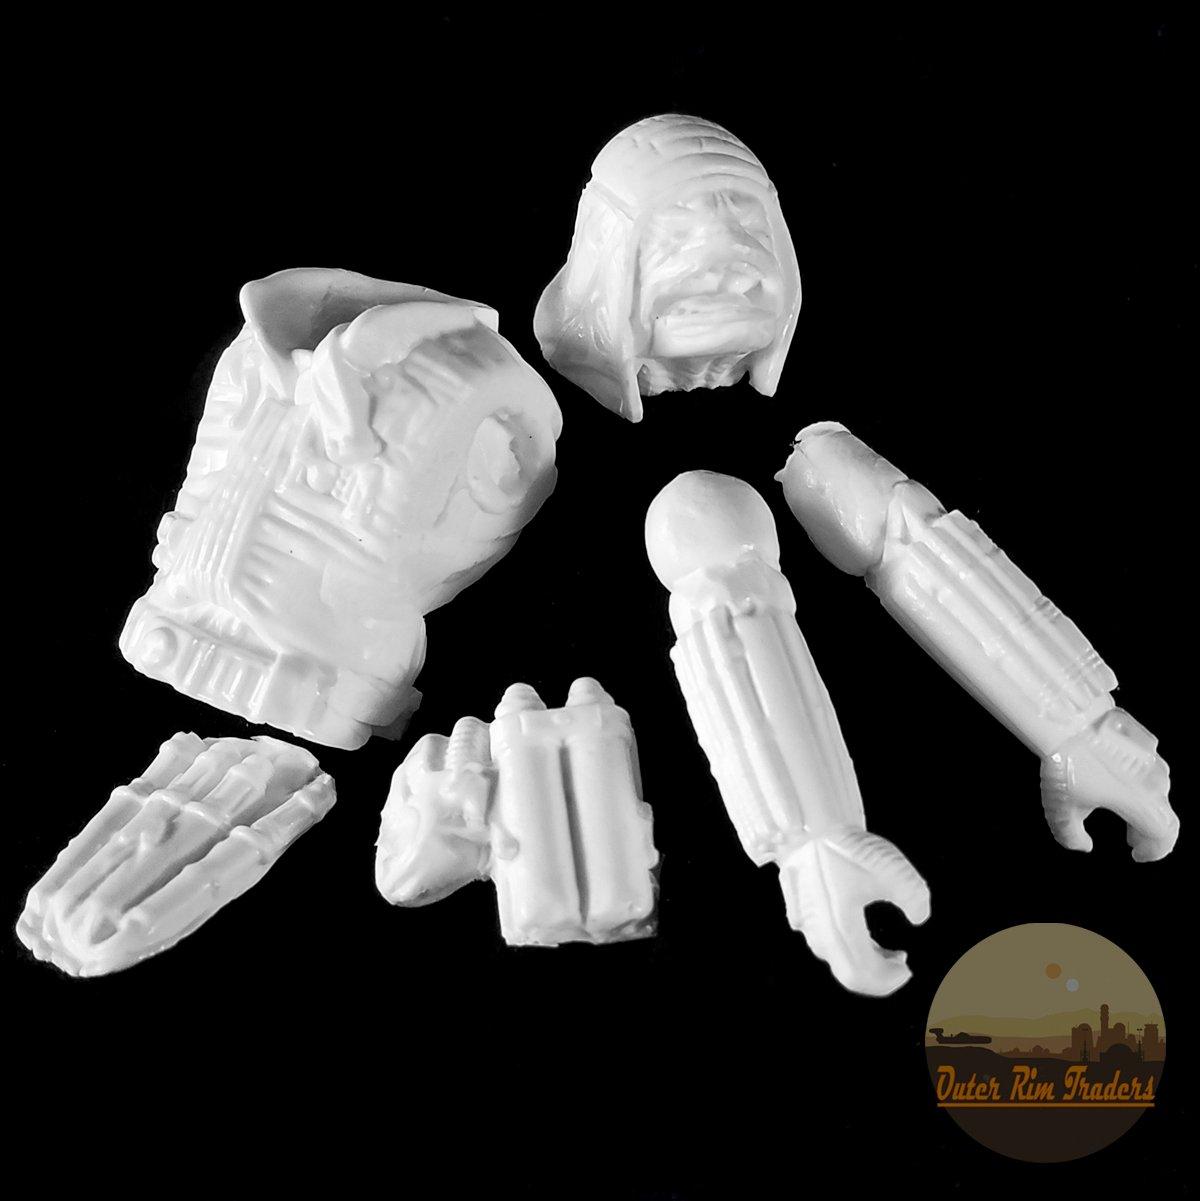 Image of Rogue Alien Kit